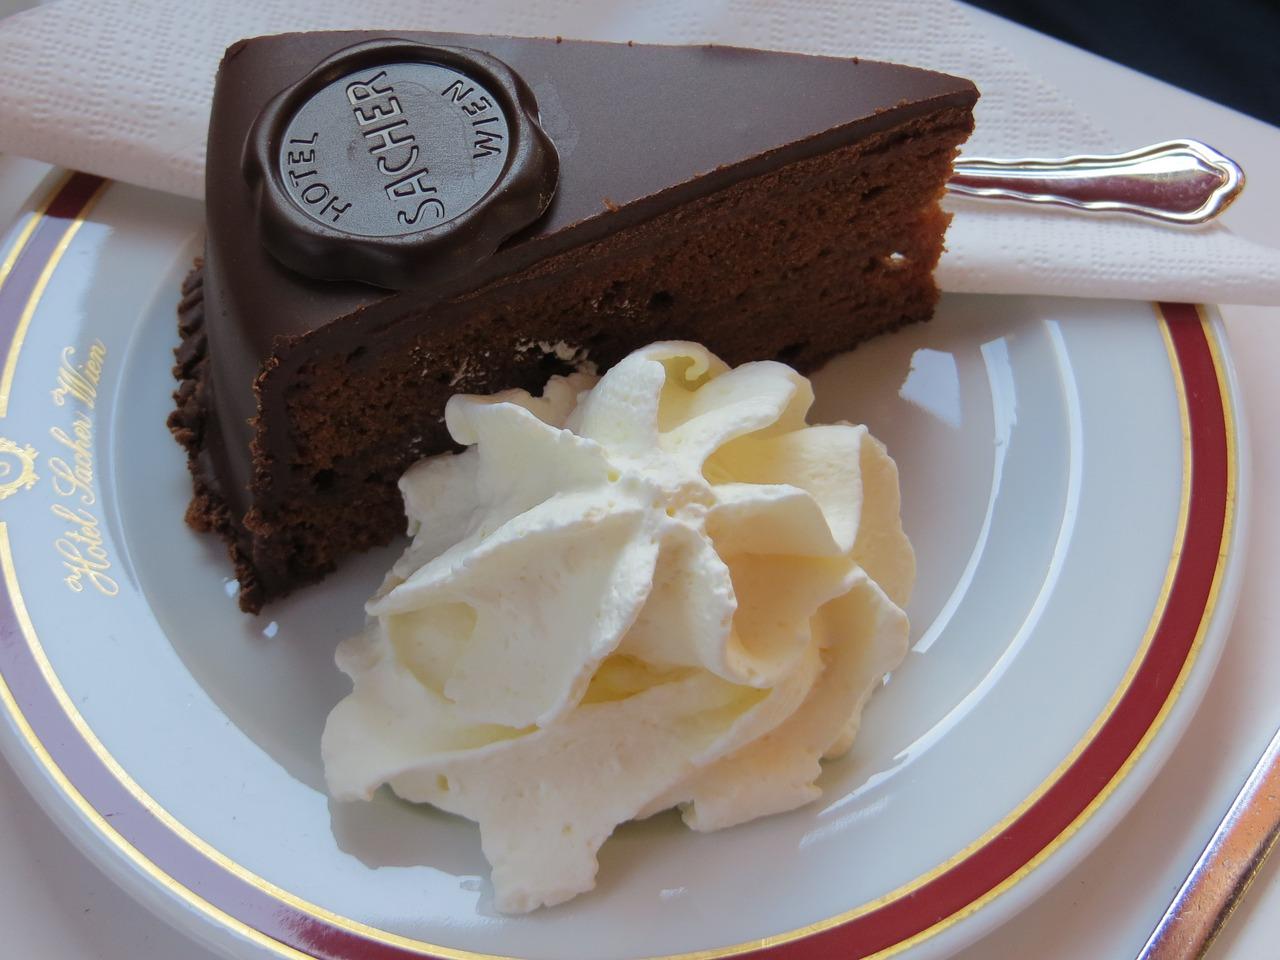 https://cestovnakancelariadaka.sk/files/product/sacher-cake-1280575_1280.jpg